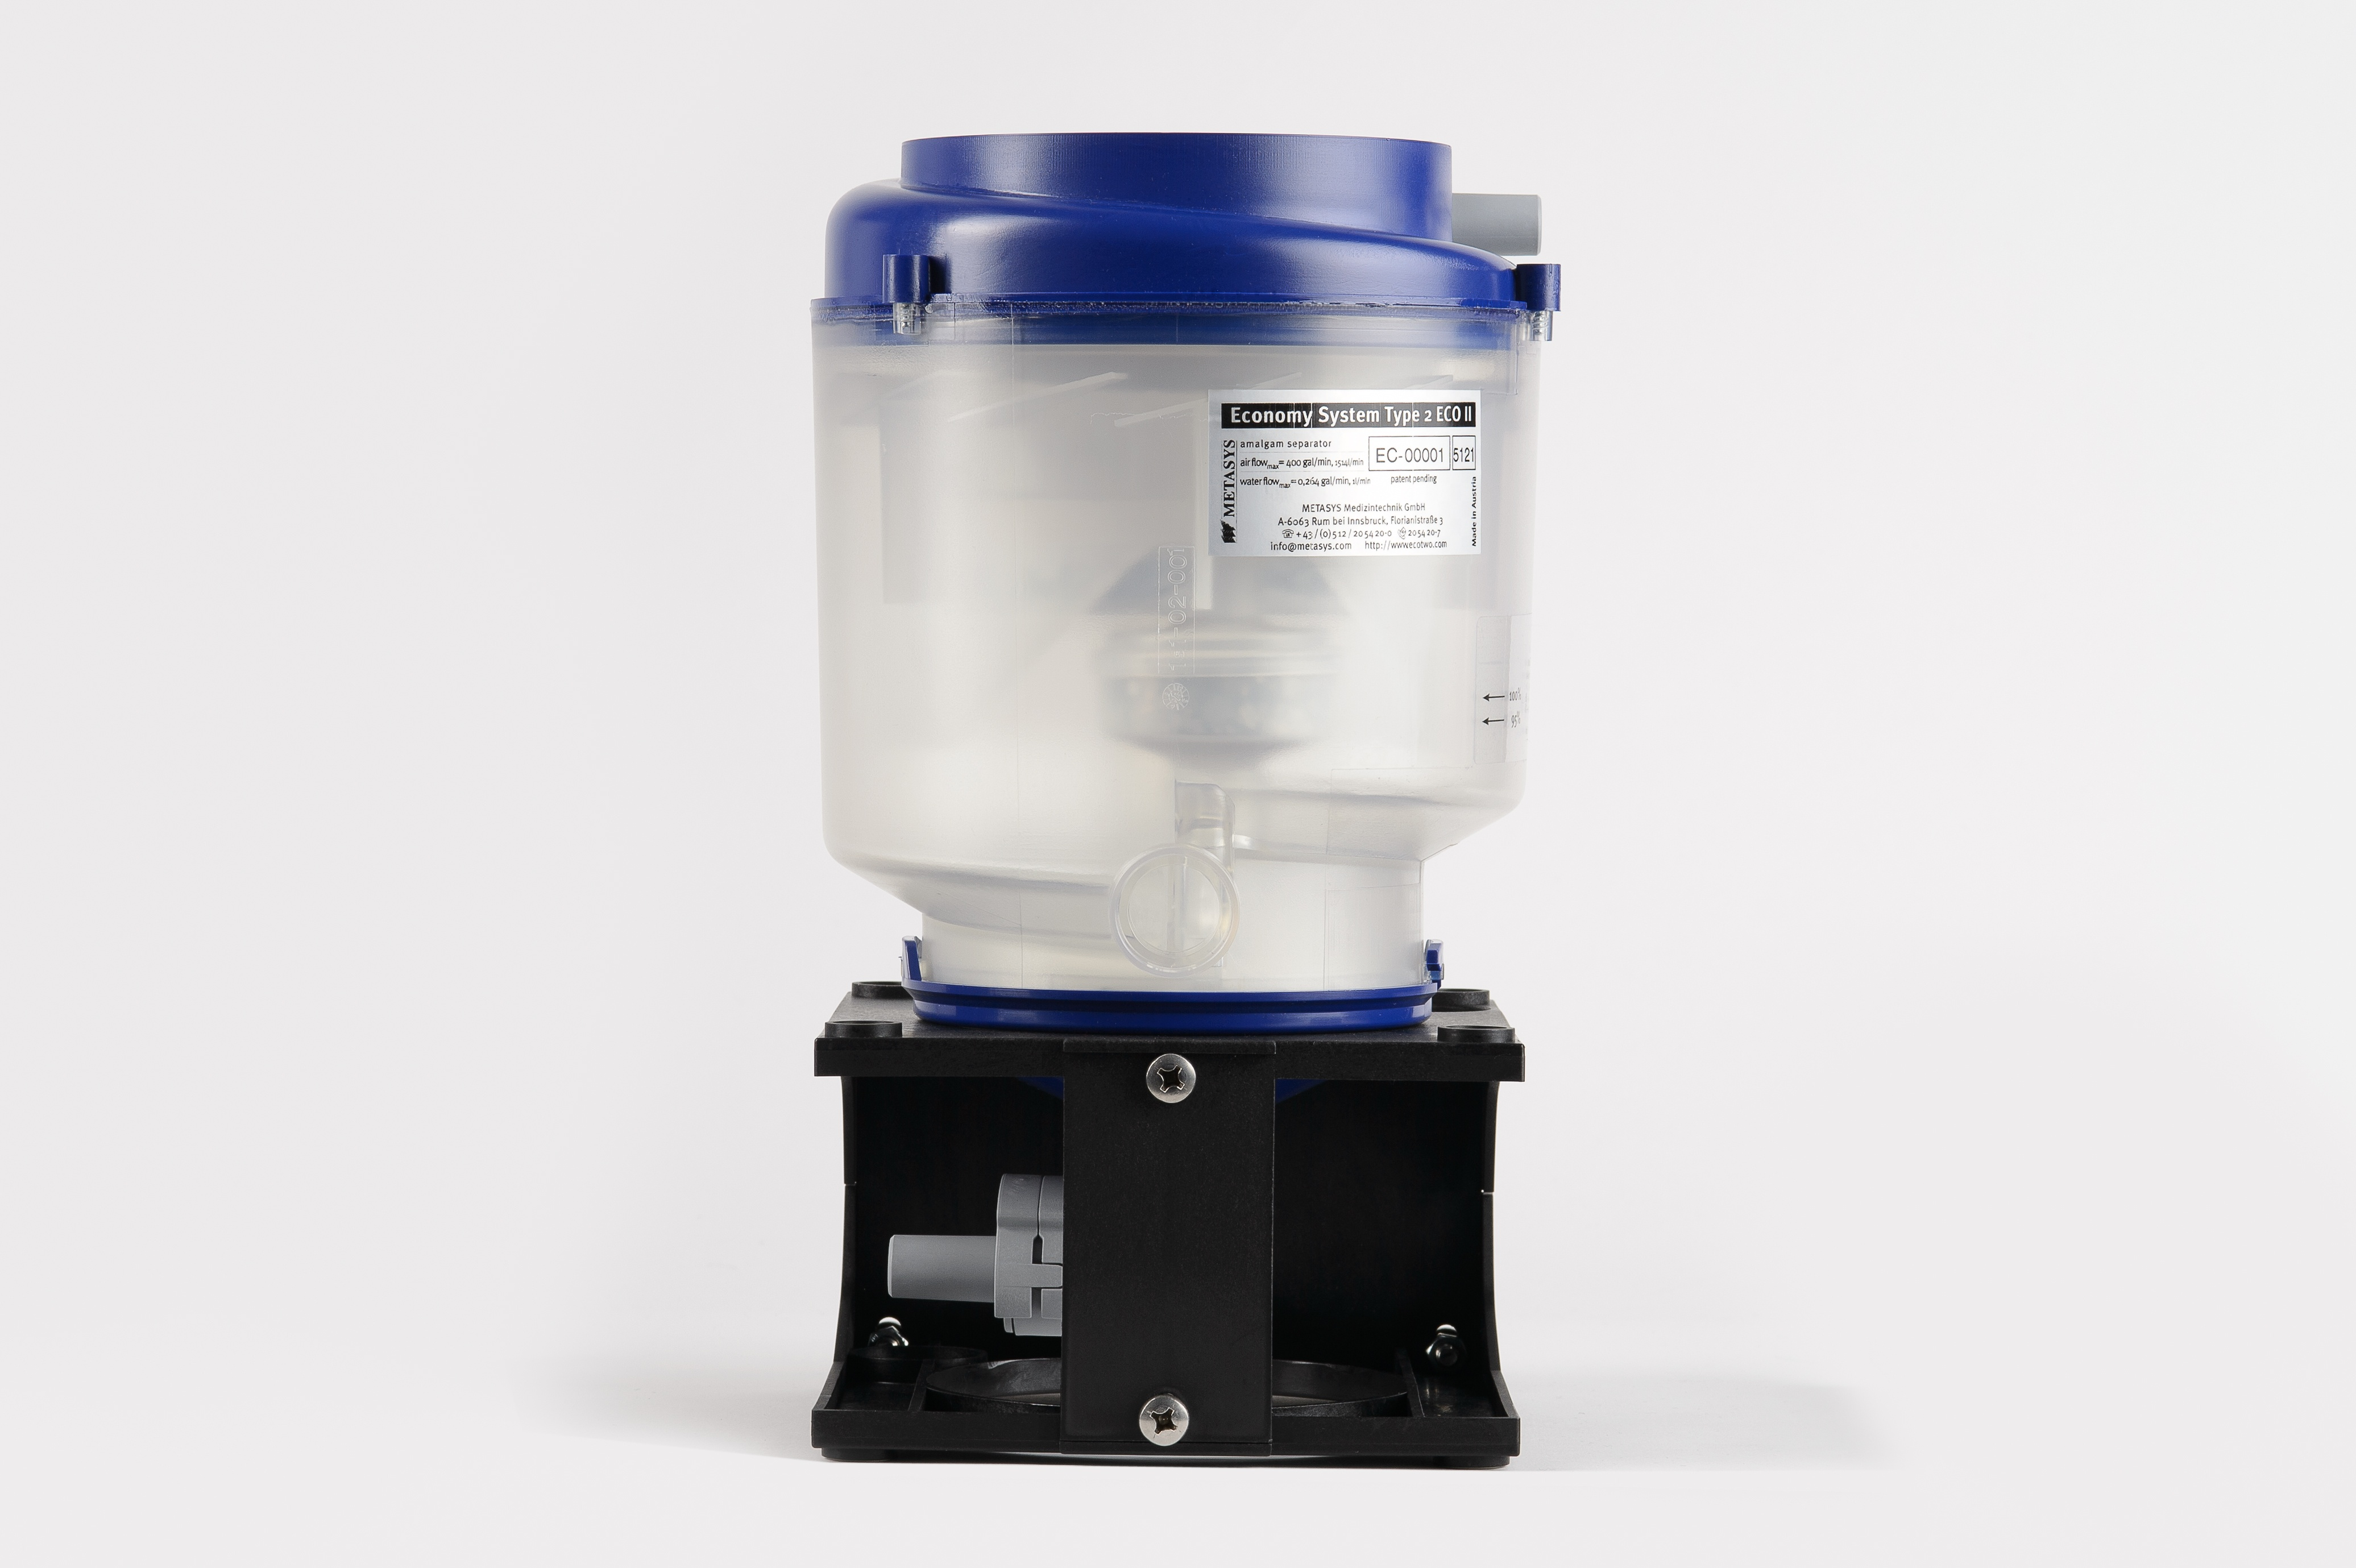 The Eco Ii Amalgam Separator